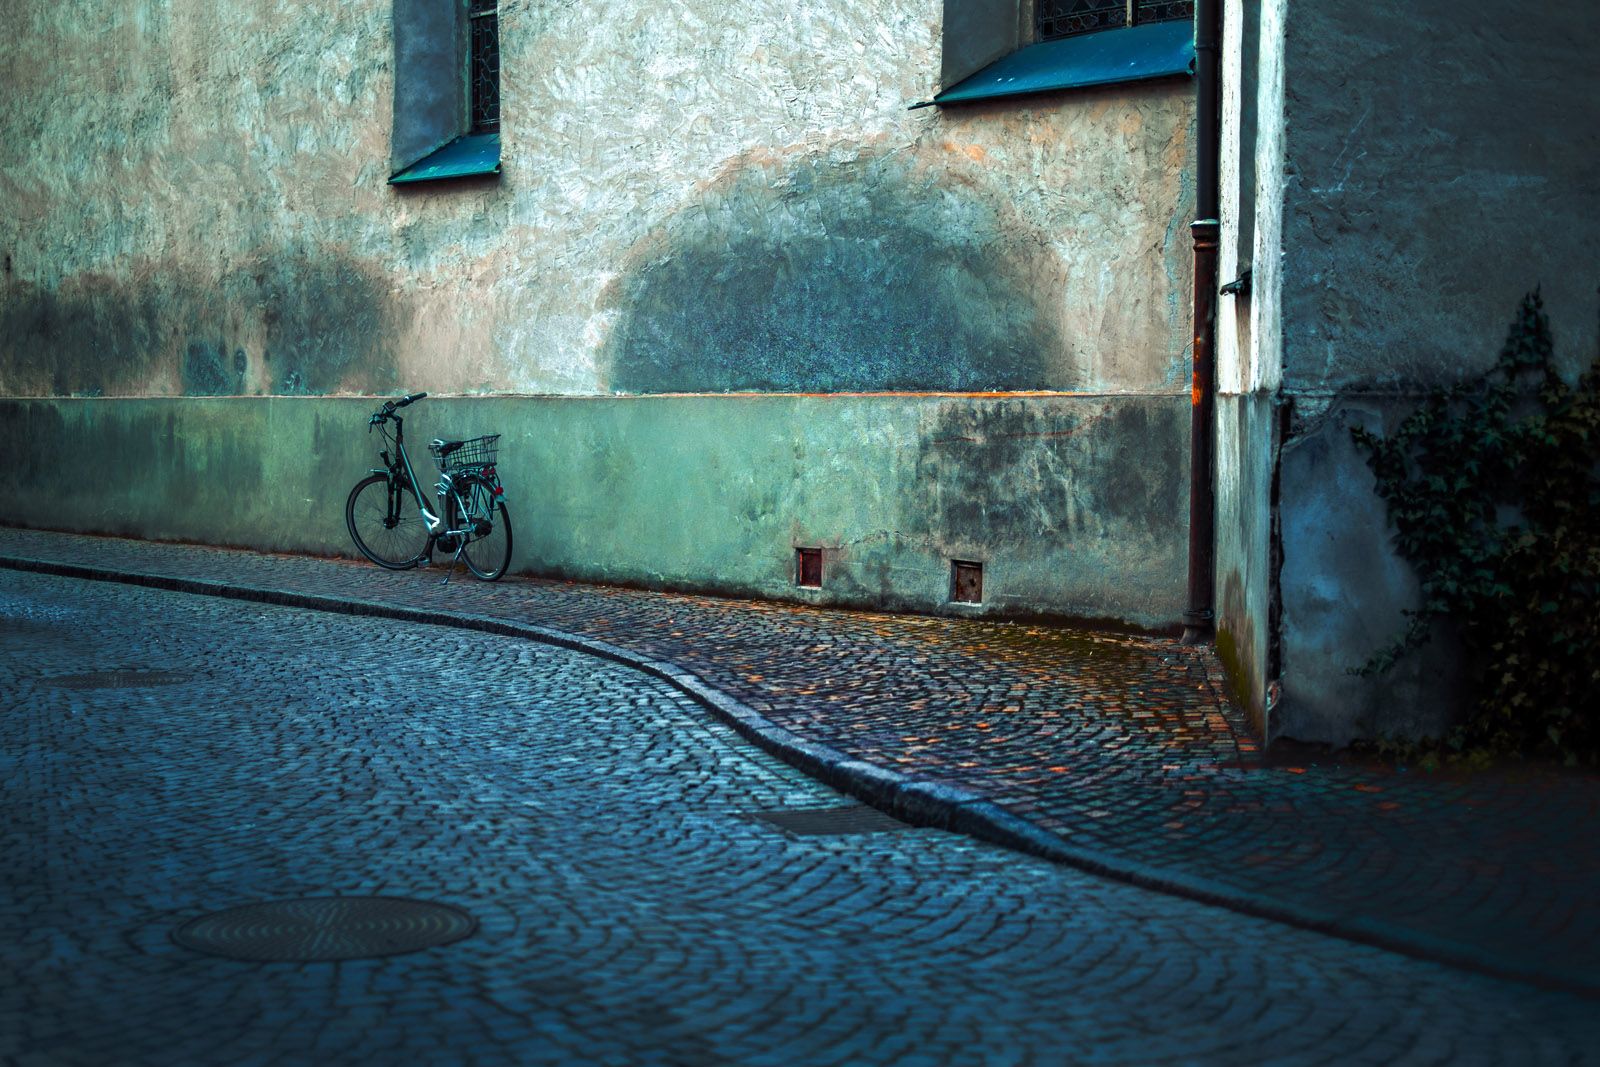 Vincent_s-bicycle.jpg